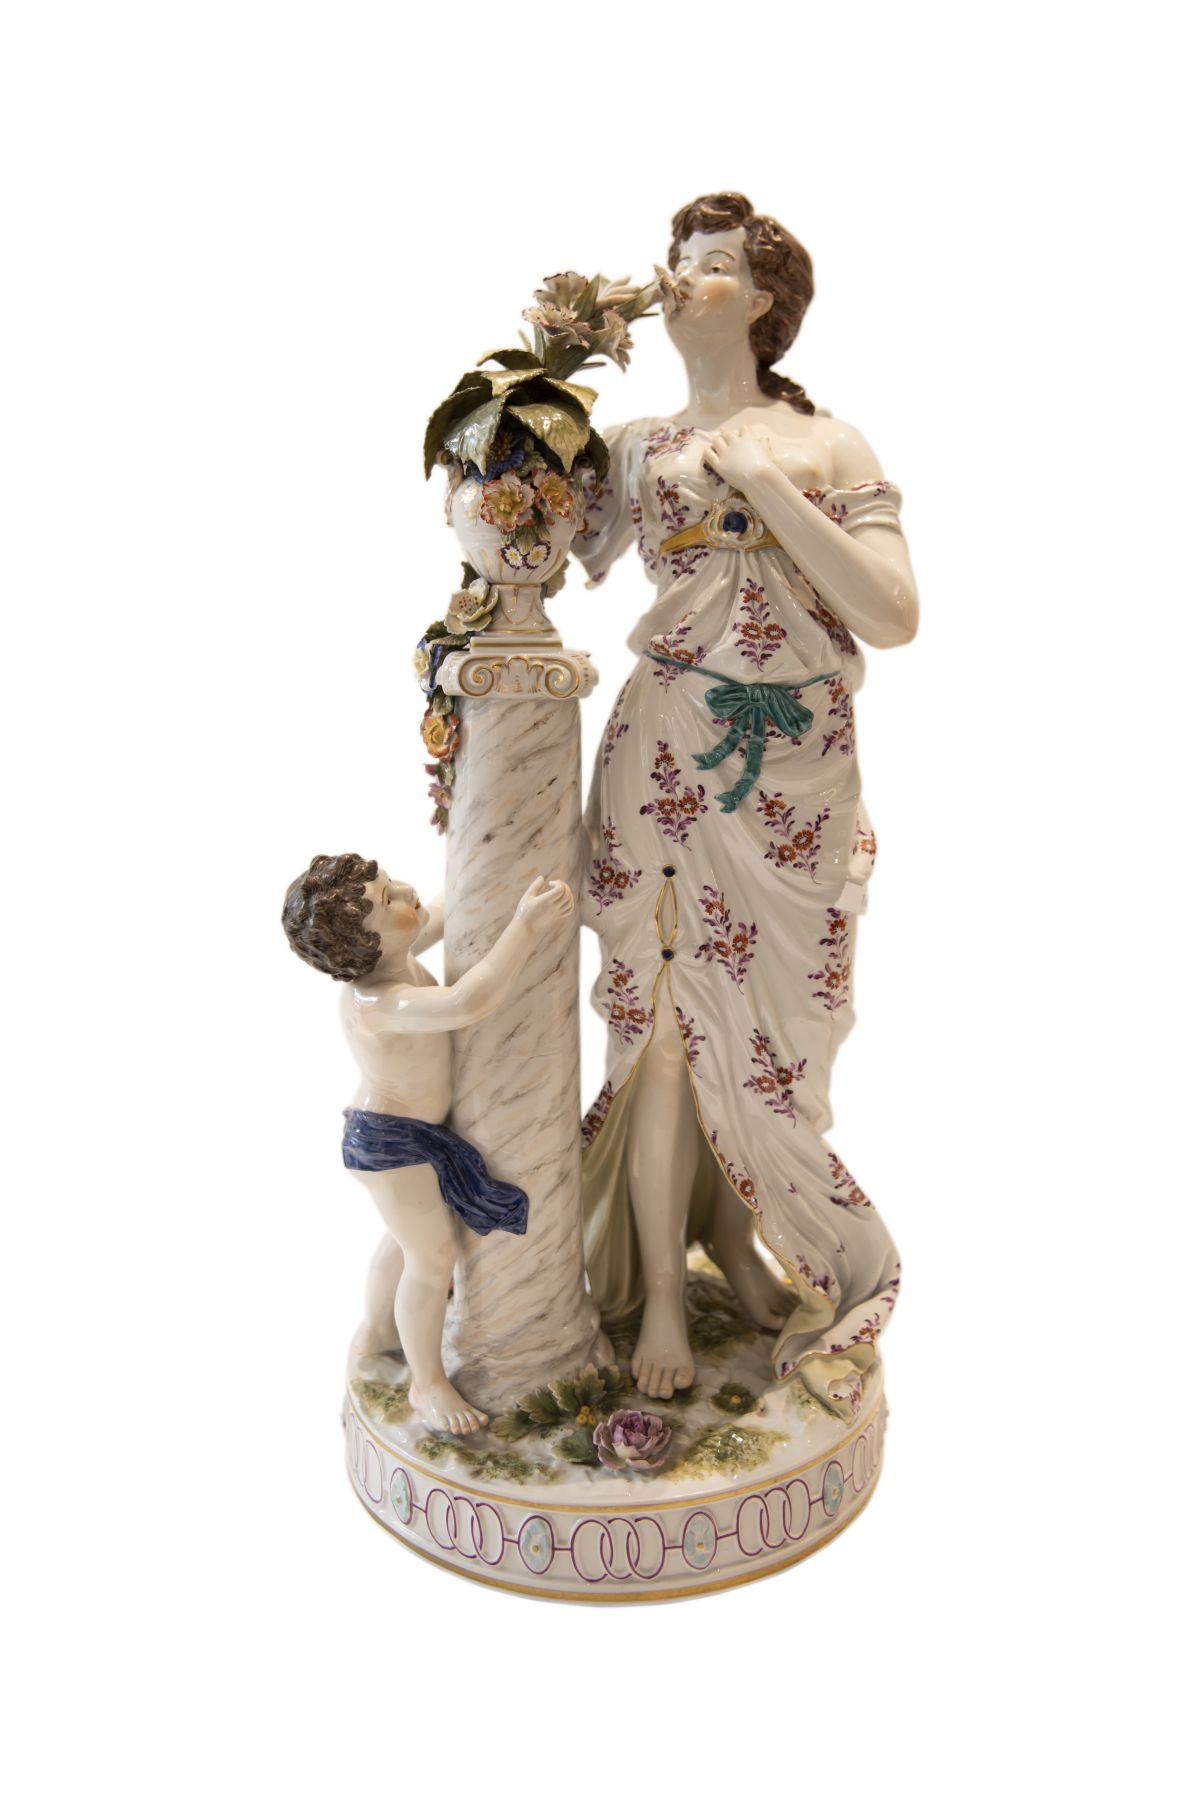 #269 Female porcelain Figurine Viennese porcelain manufactory   Weibliche Porzellan Figur Wiener Porzellan Manufaktur Image